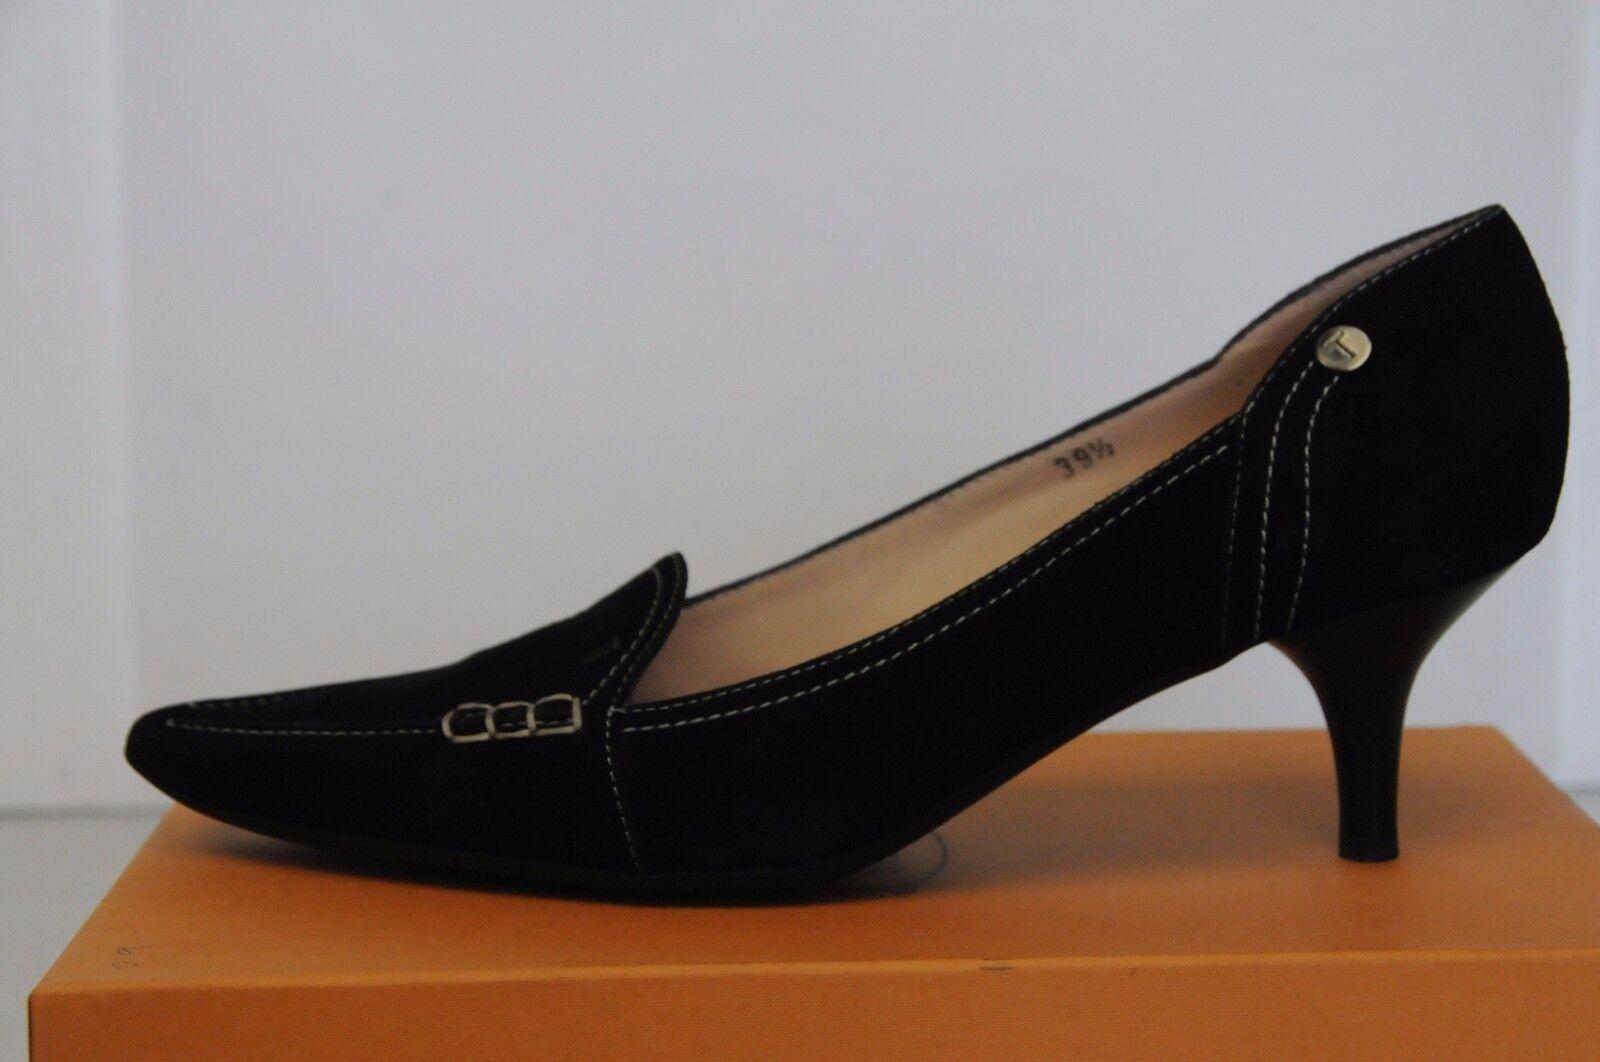 New TOD'S Fondo Novak Mocassins Driving shoes Suede Black Suede shoes 39.5 12c615